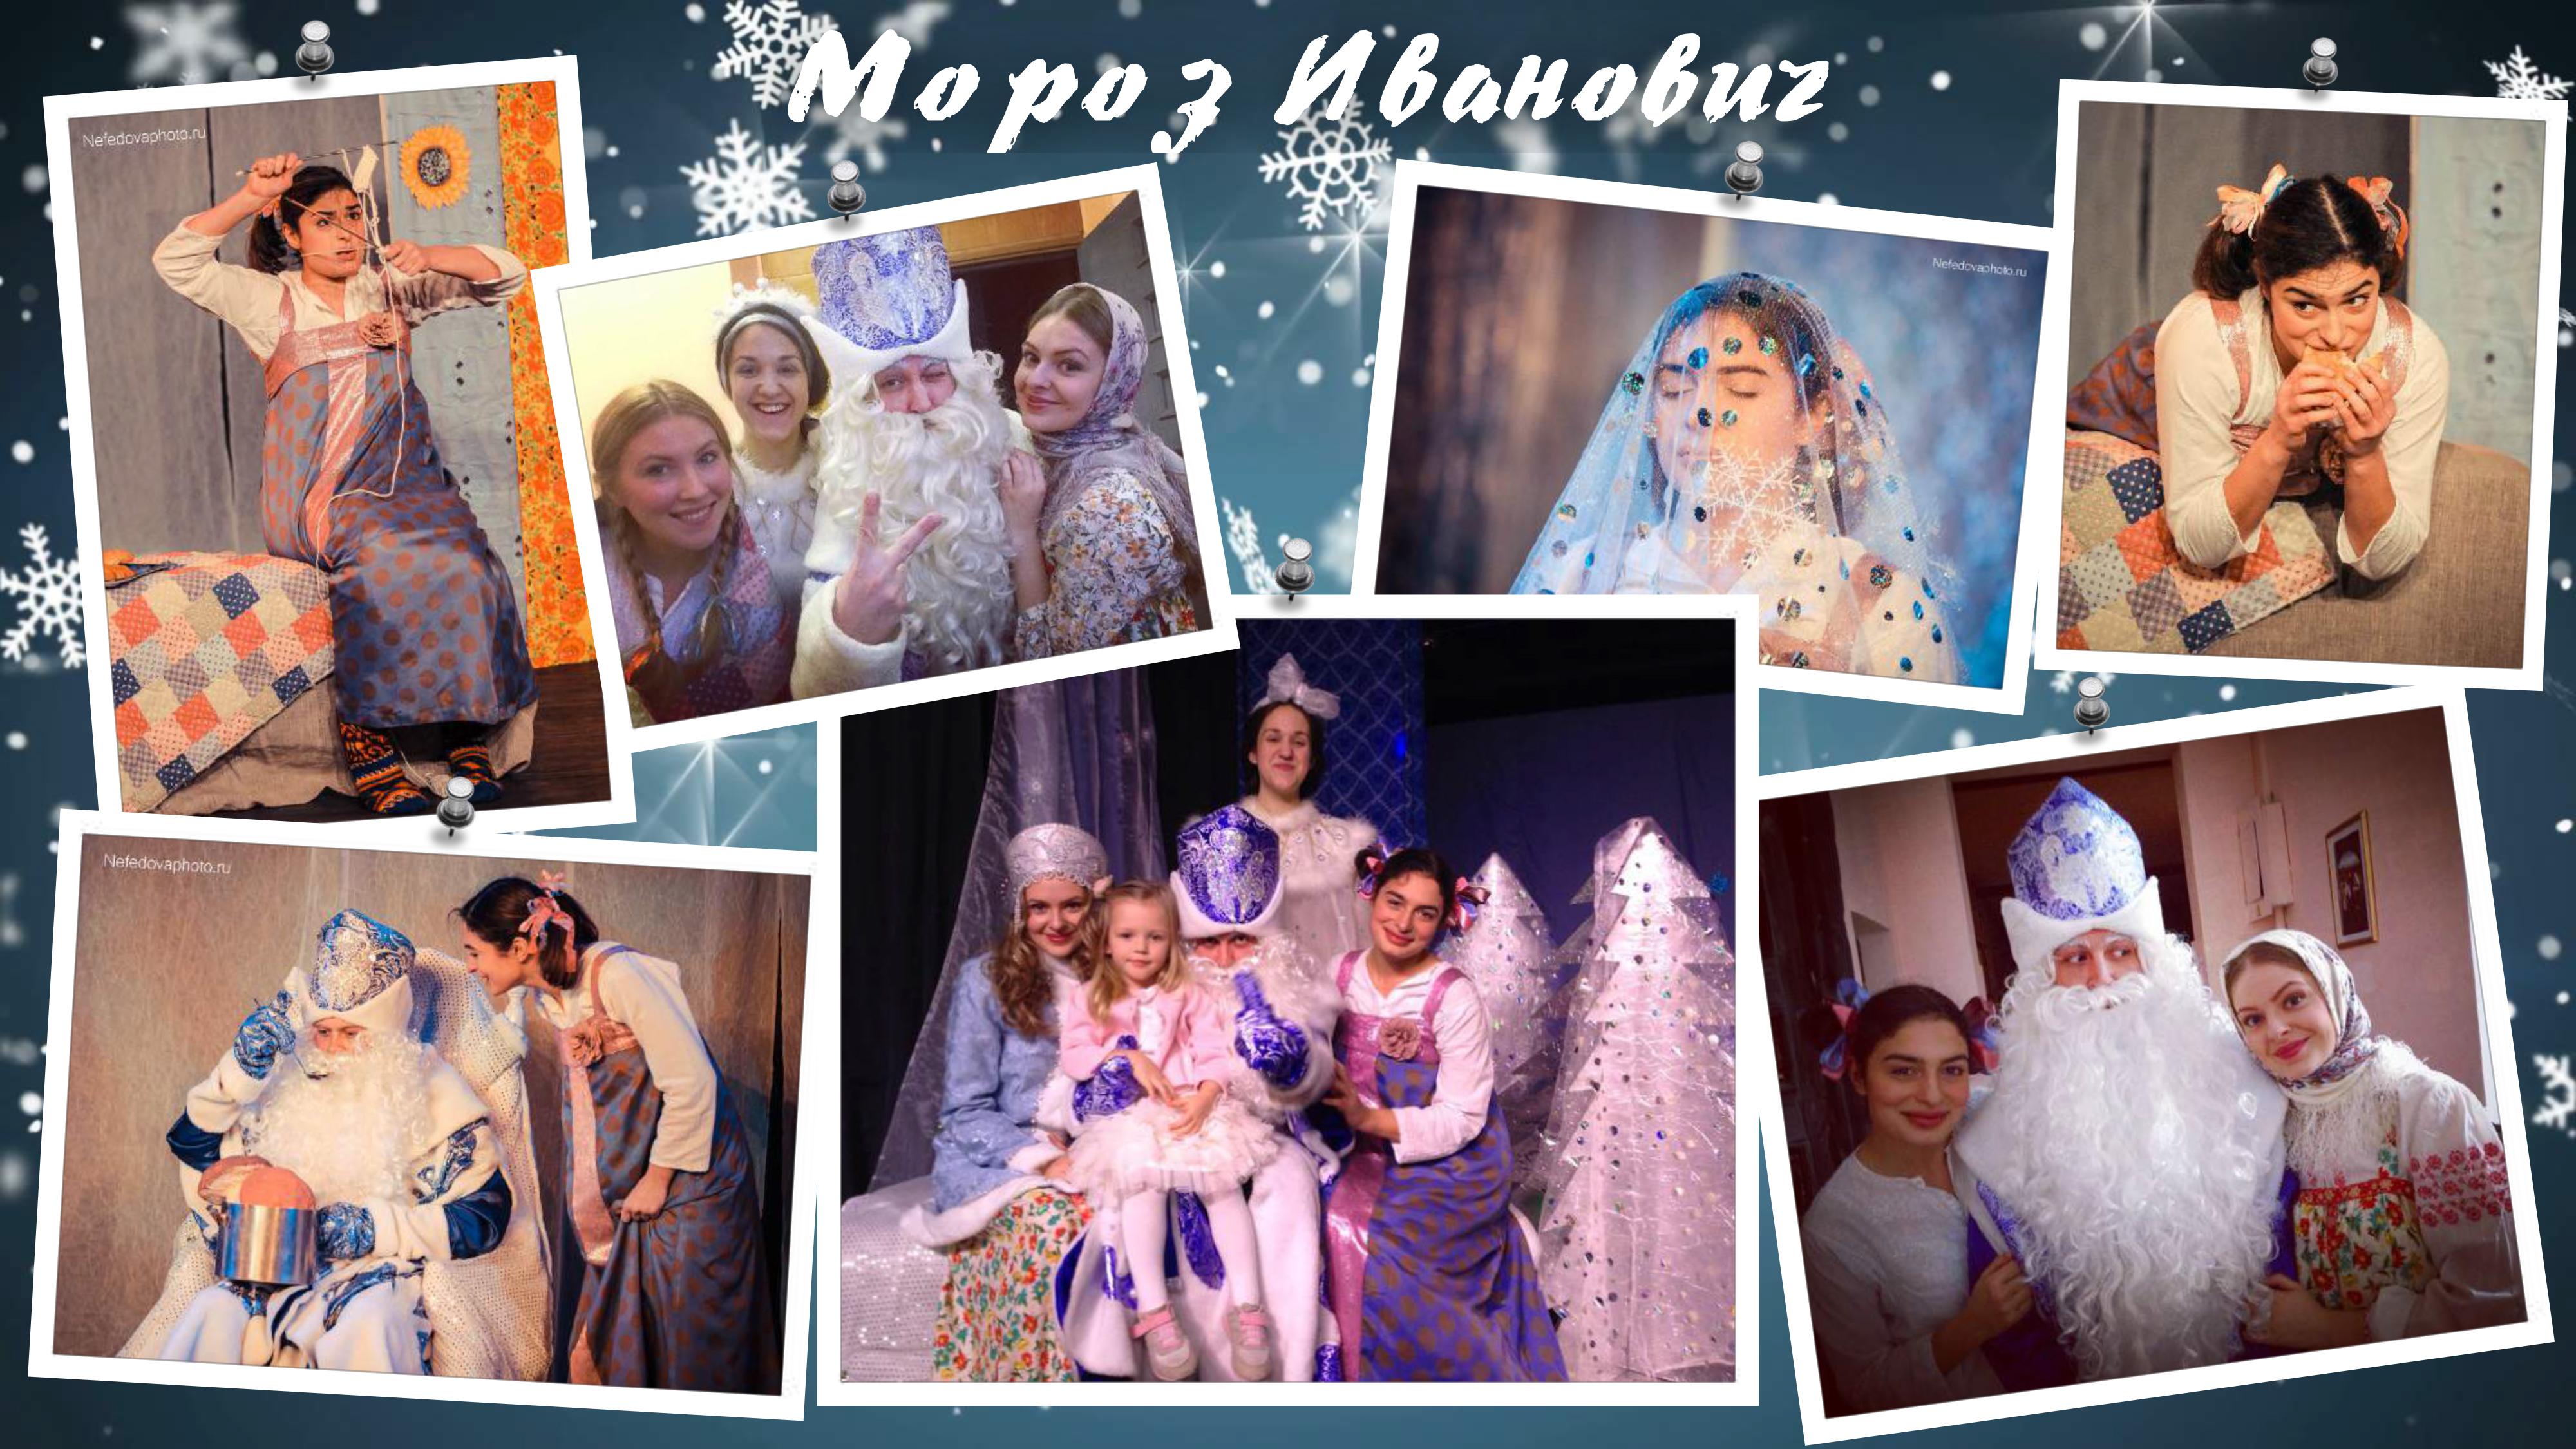 Spektakl-Moroz-Ivanovich-4